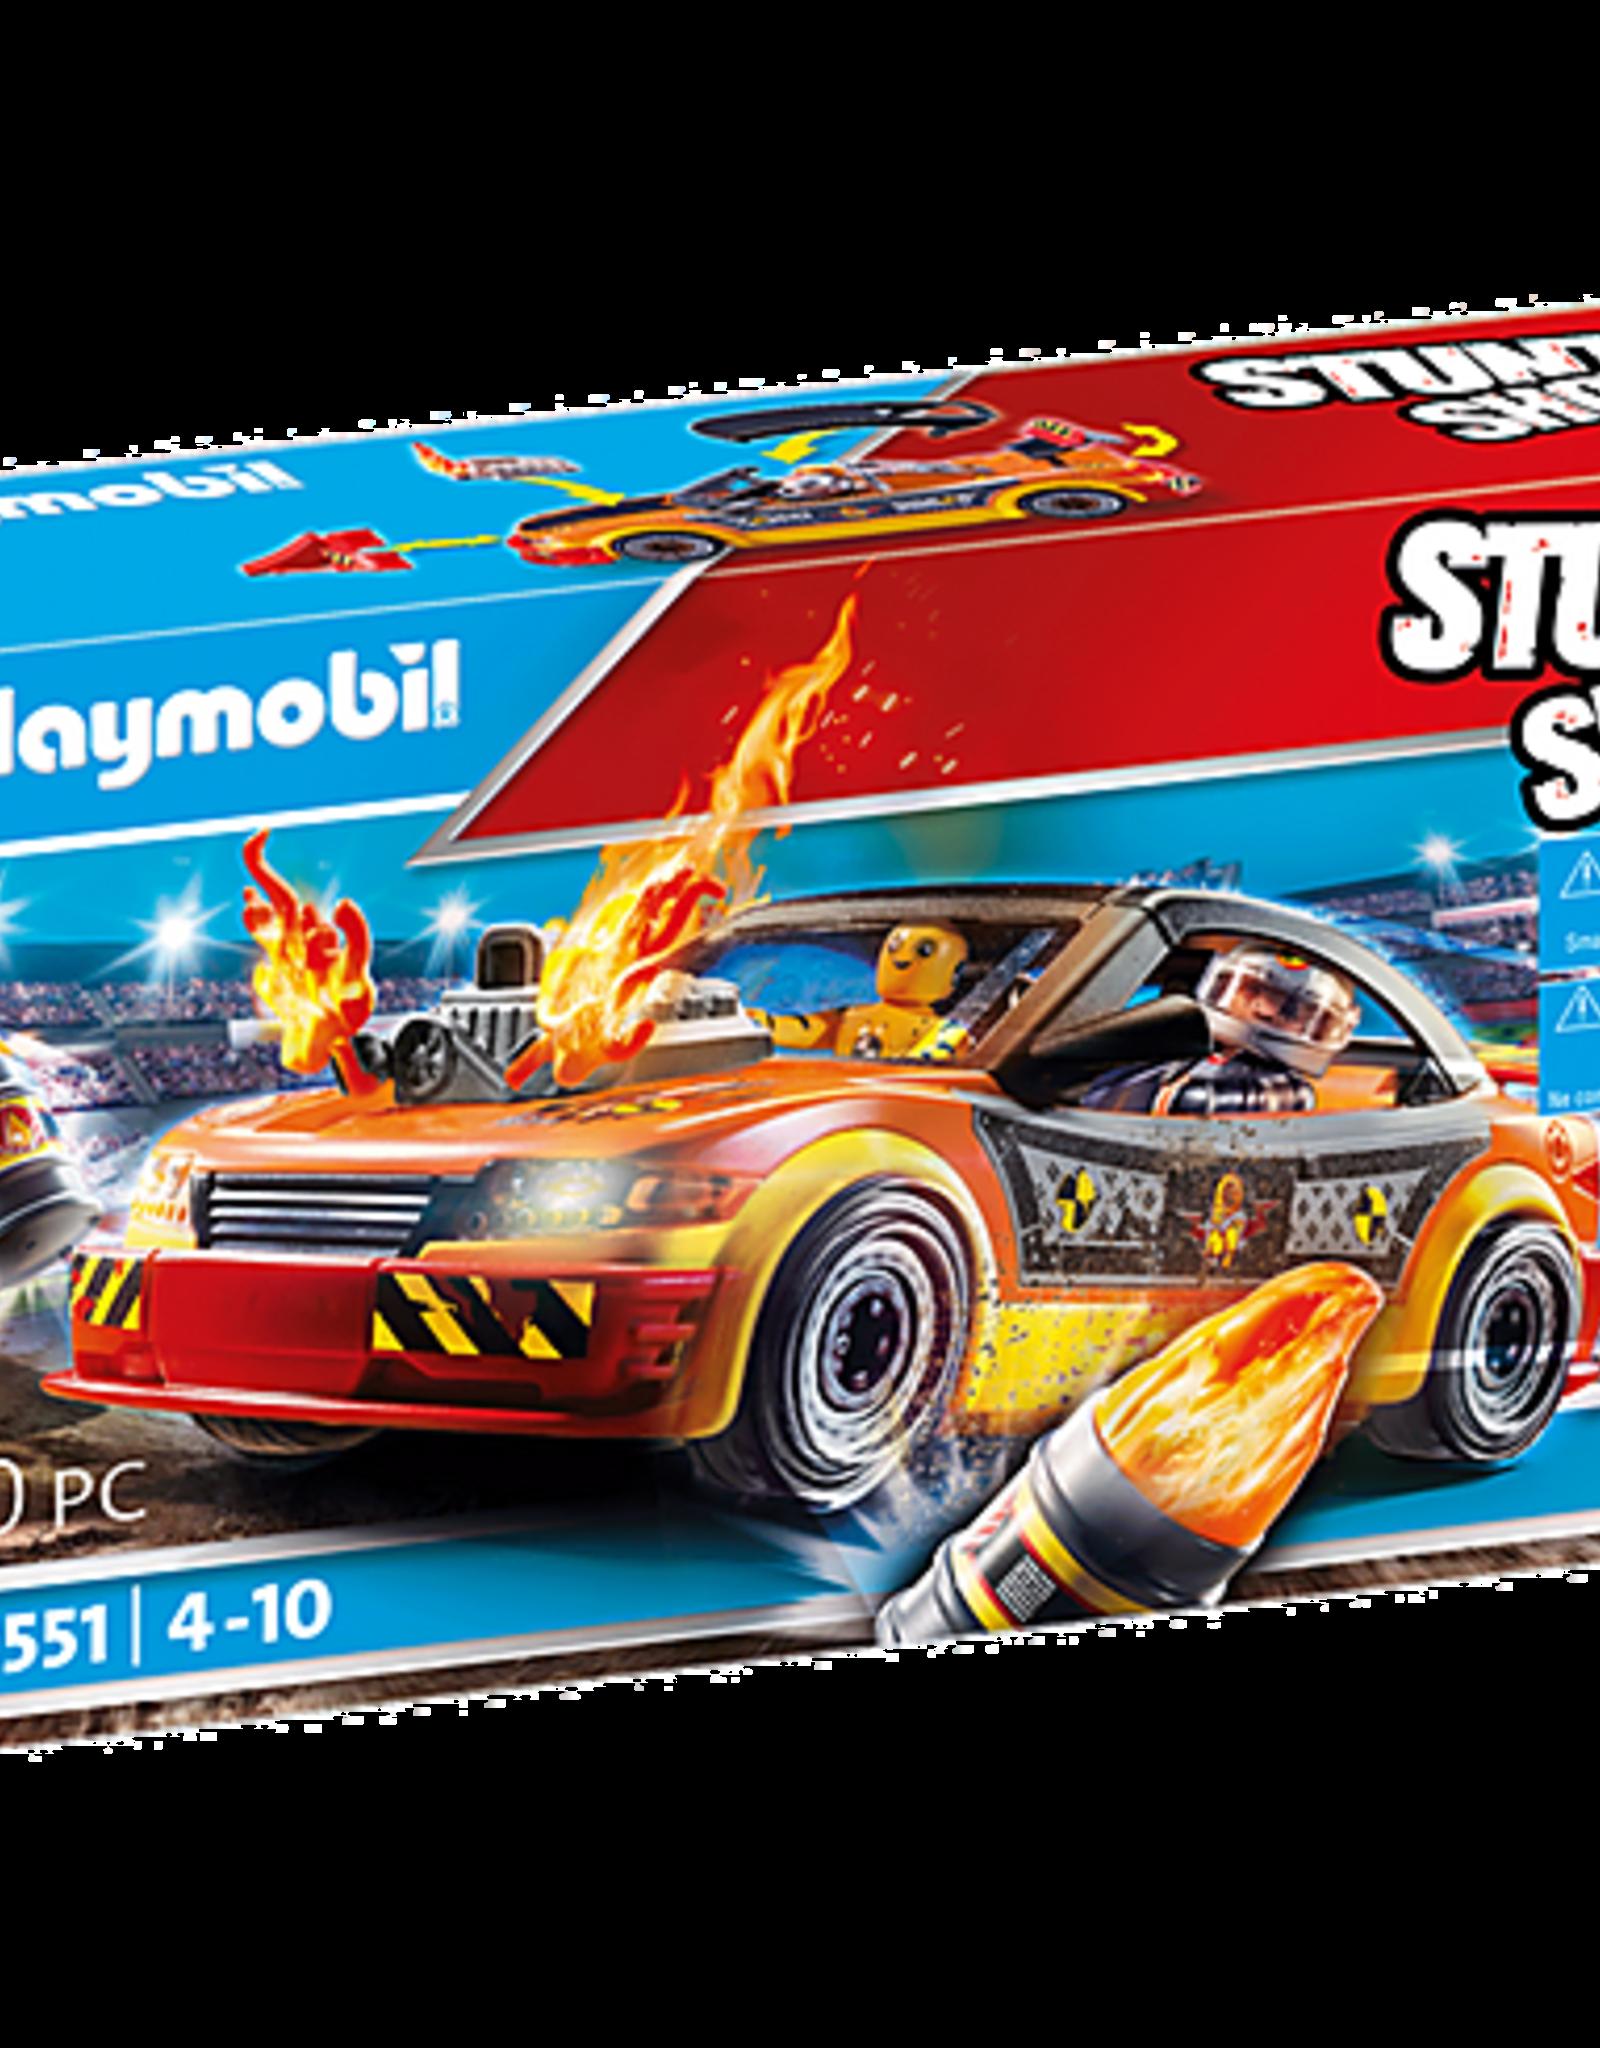 Playmobil PM Stunt Show Crash Car